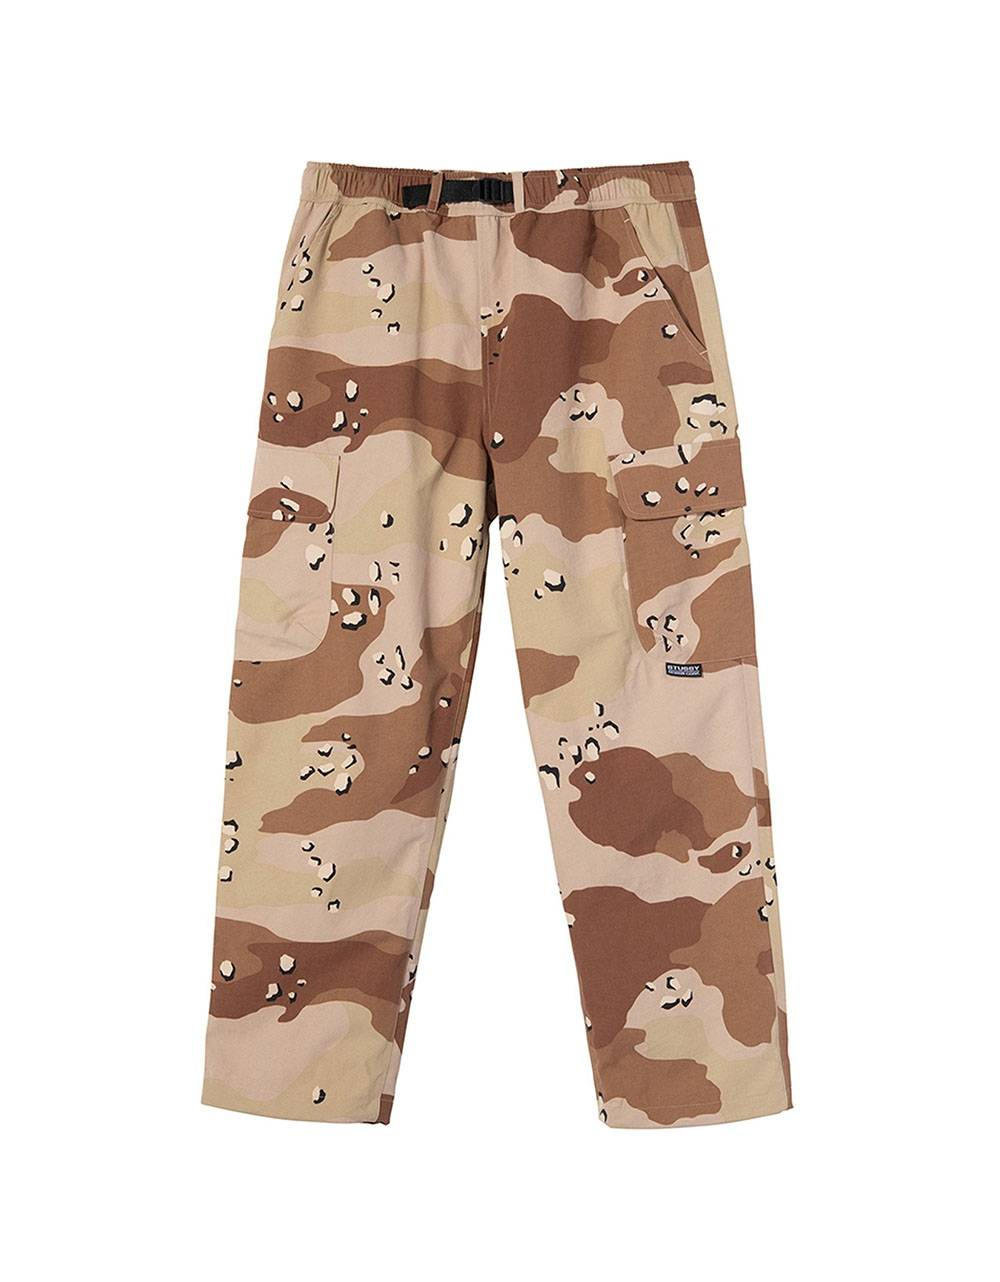 Stussy taped seam cargo pants - camo Stussy Pant 143,44€